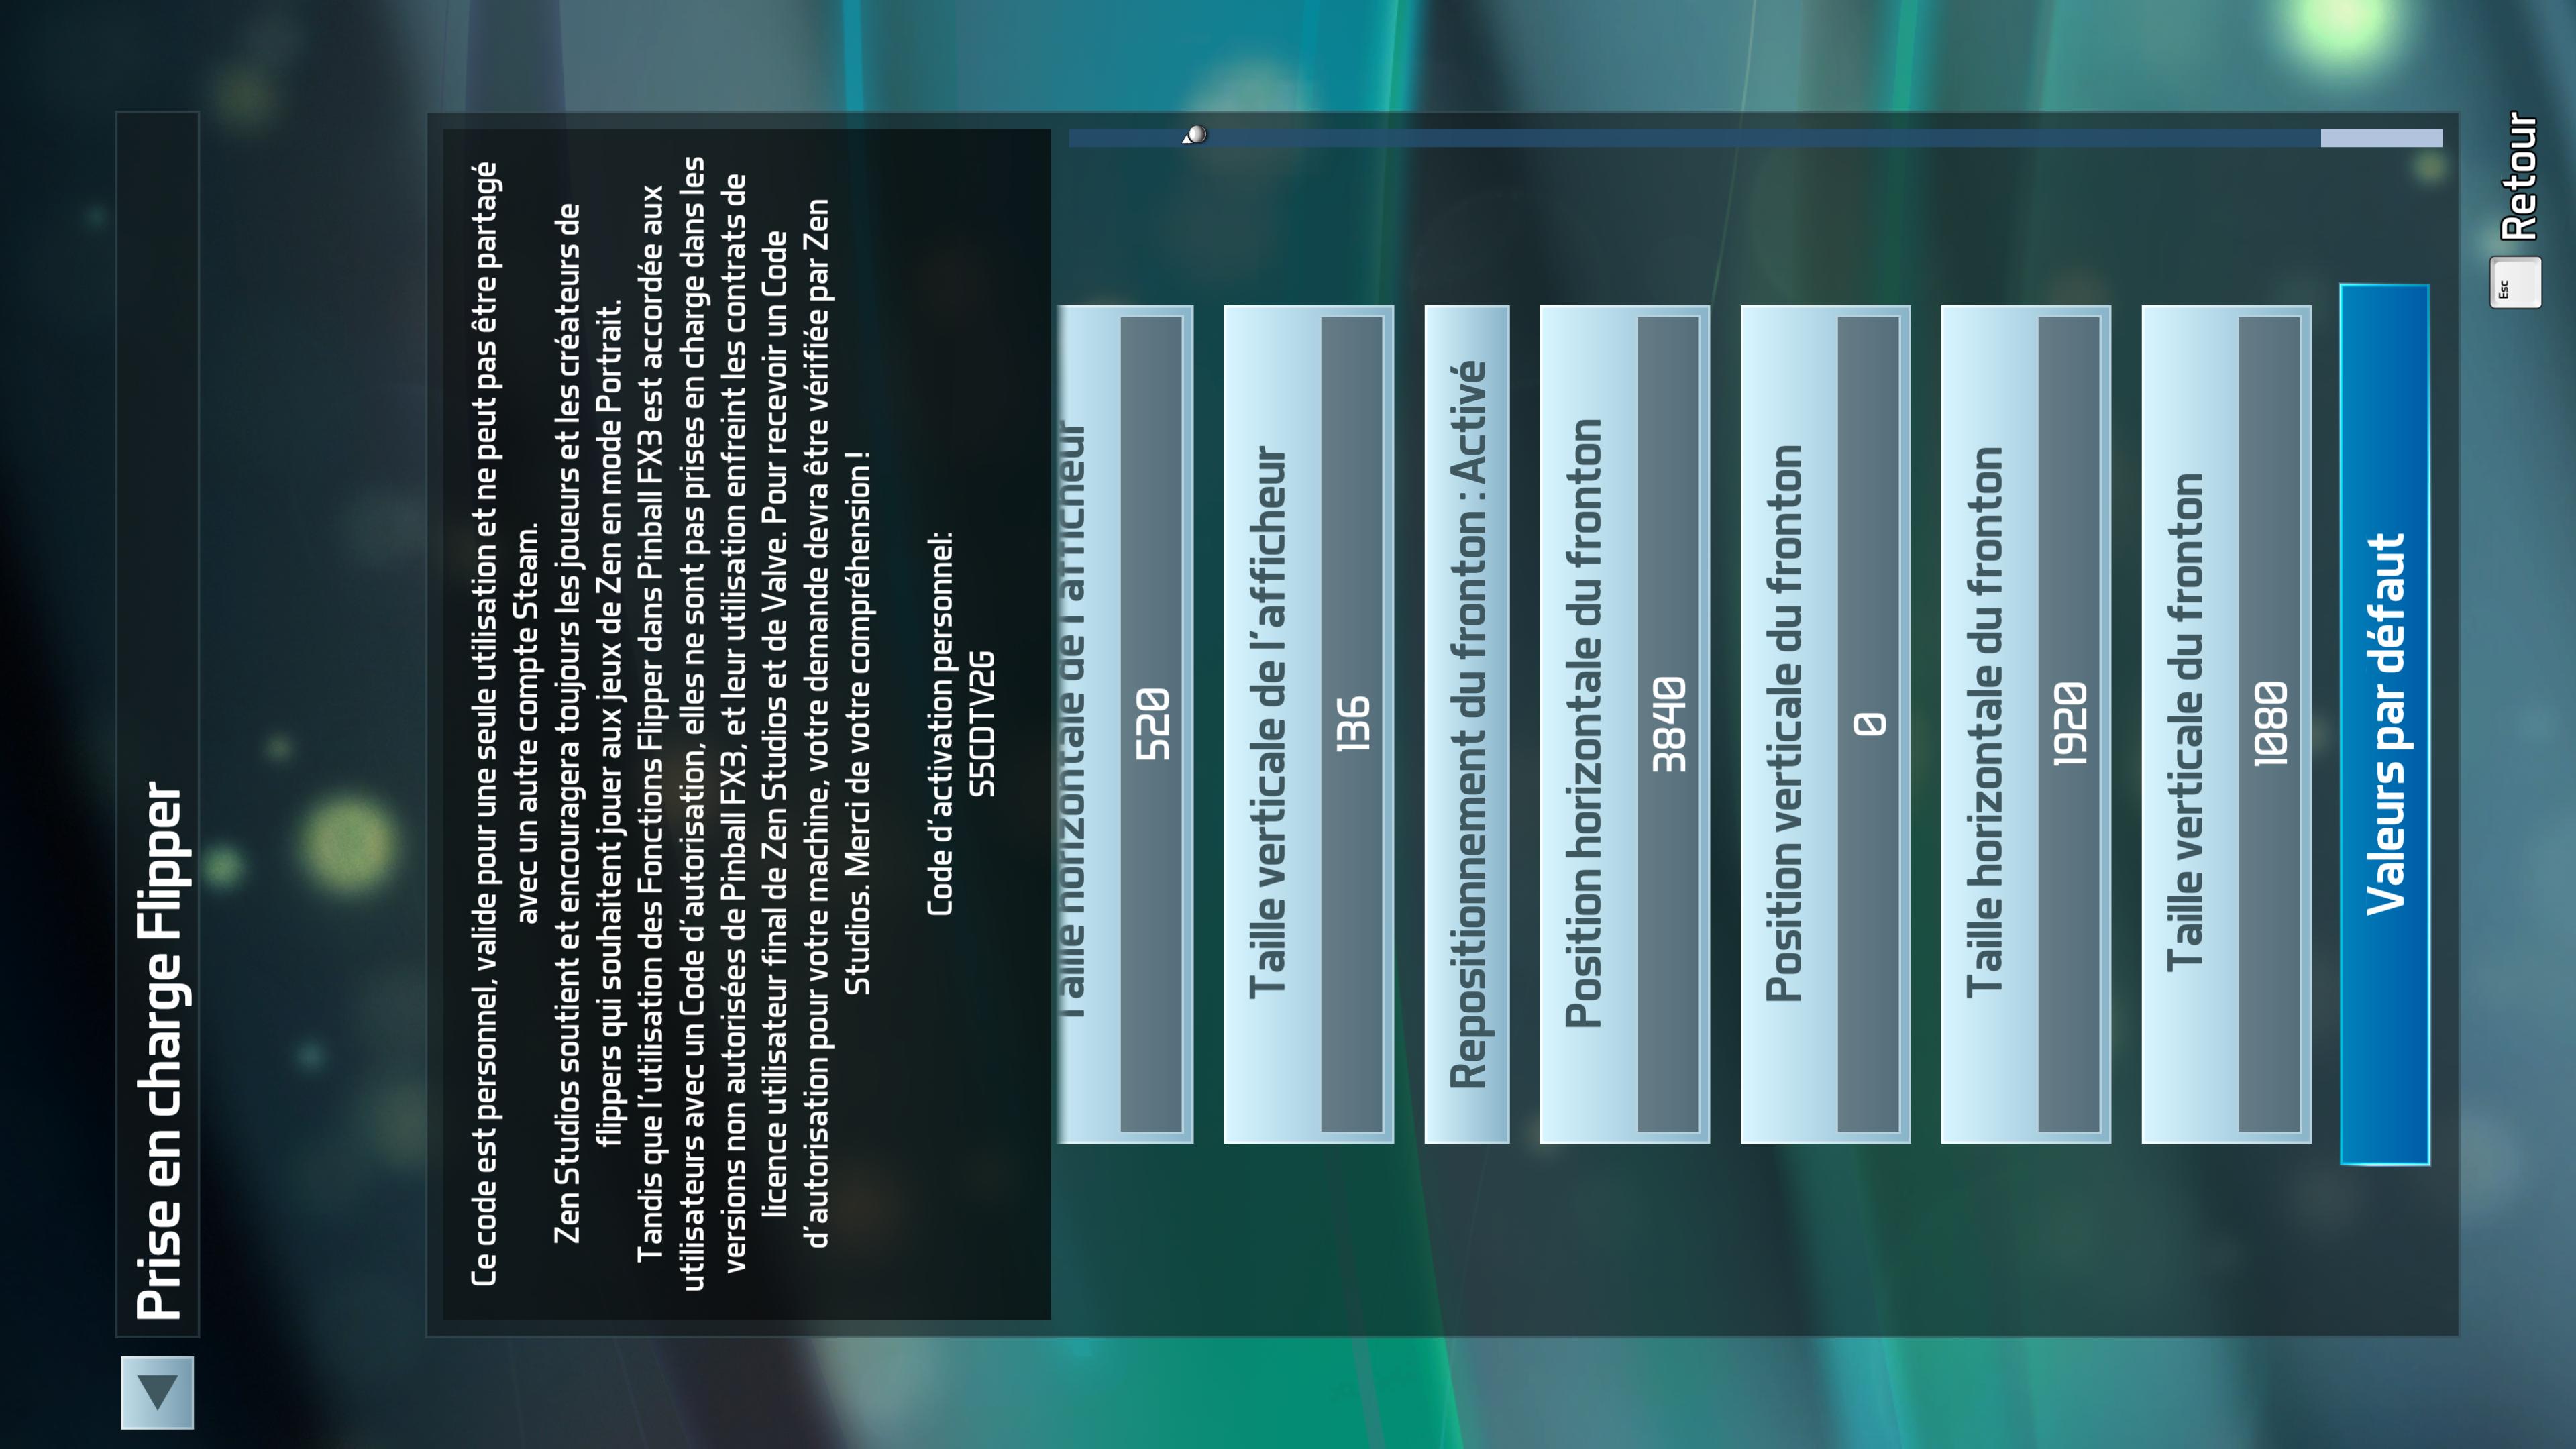 [RÉSOLU] PIN2DMD FX3 sous pinup 1565540058-pinball-fx3-11-08-2019-17-05-19